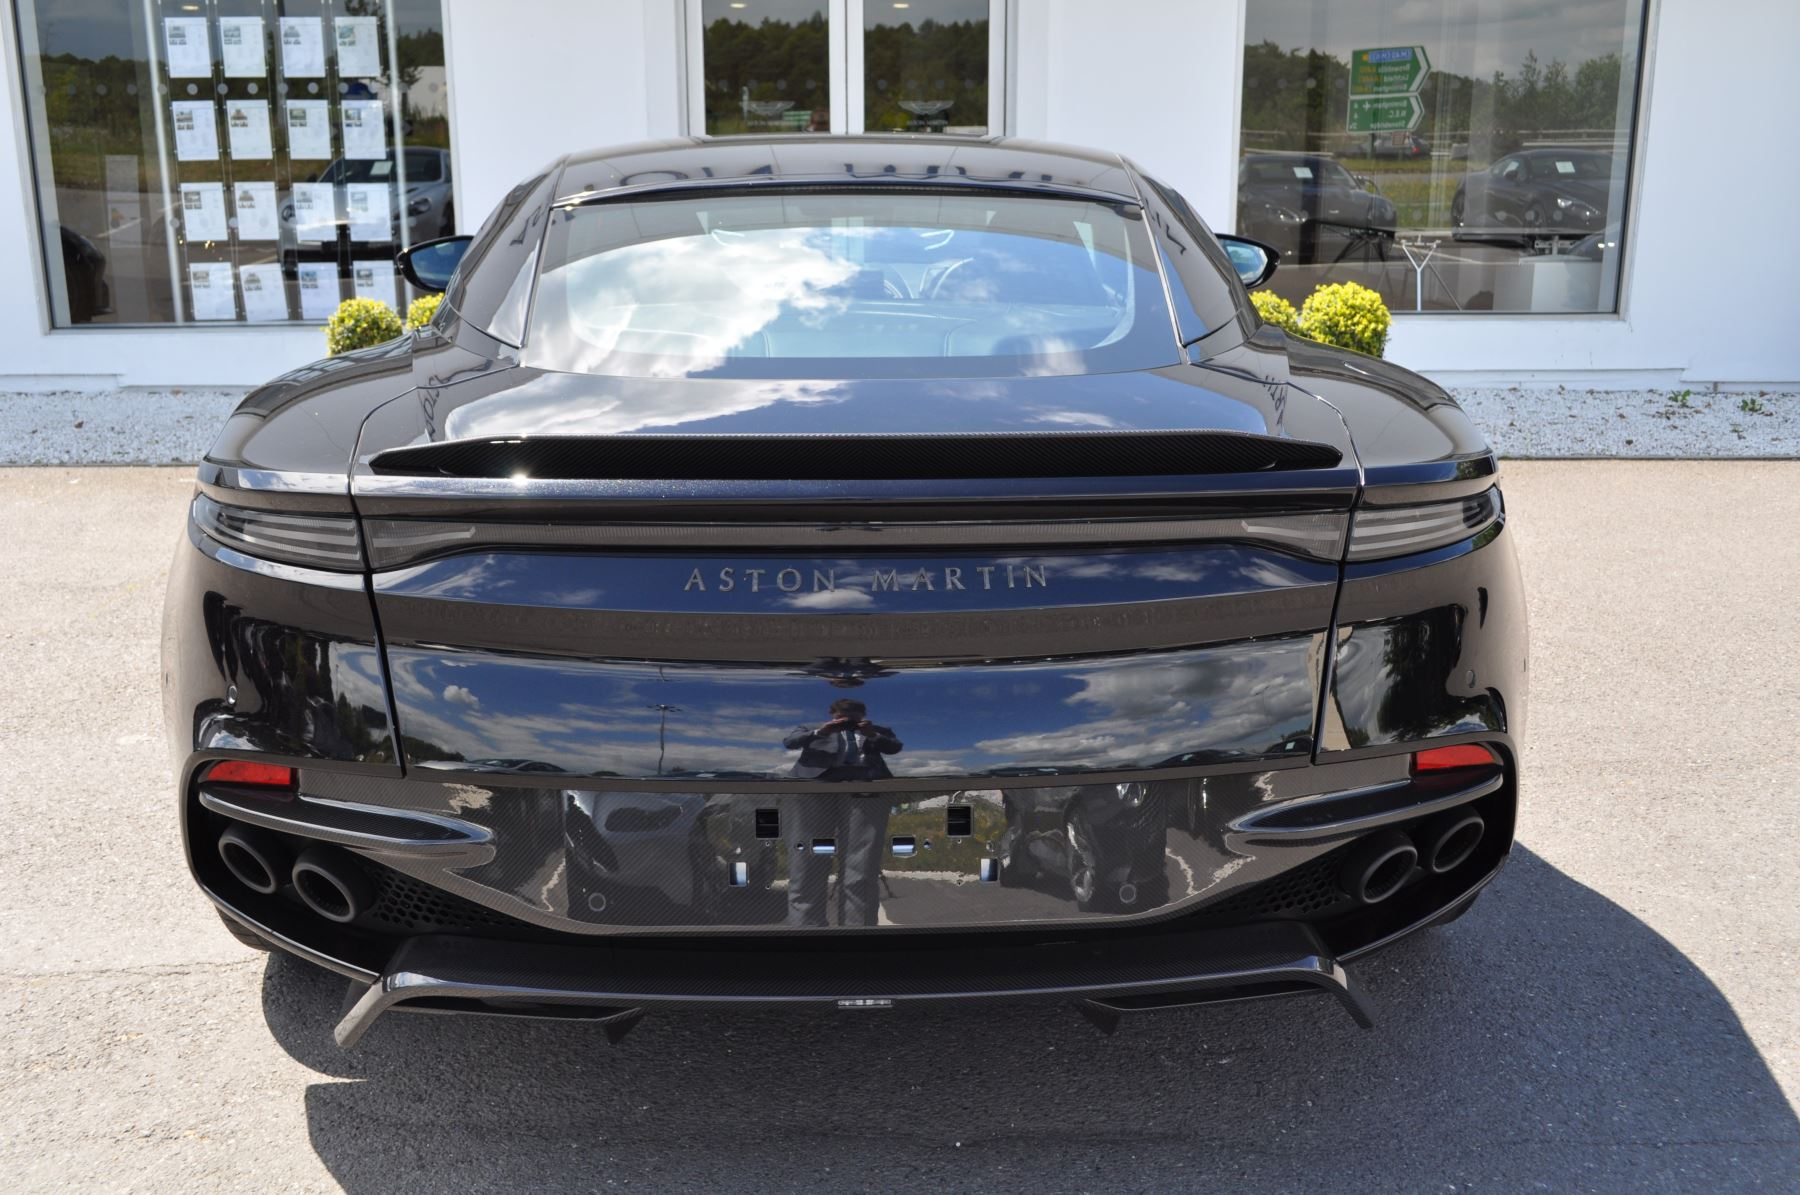 Aston Martin DBS V12 Superleggera Touchtronic image 7